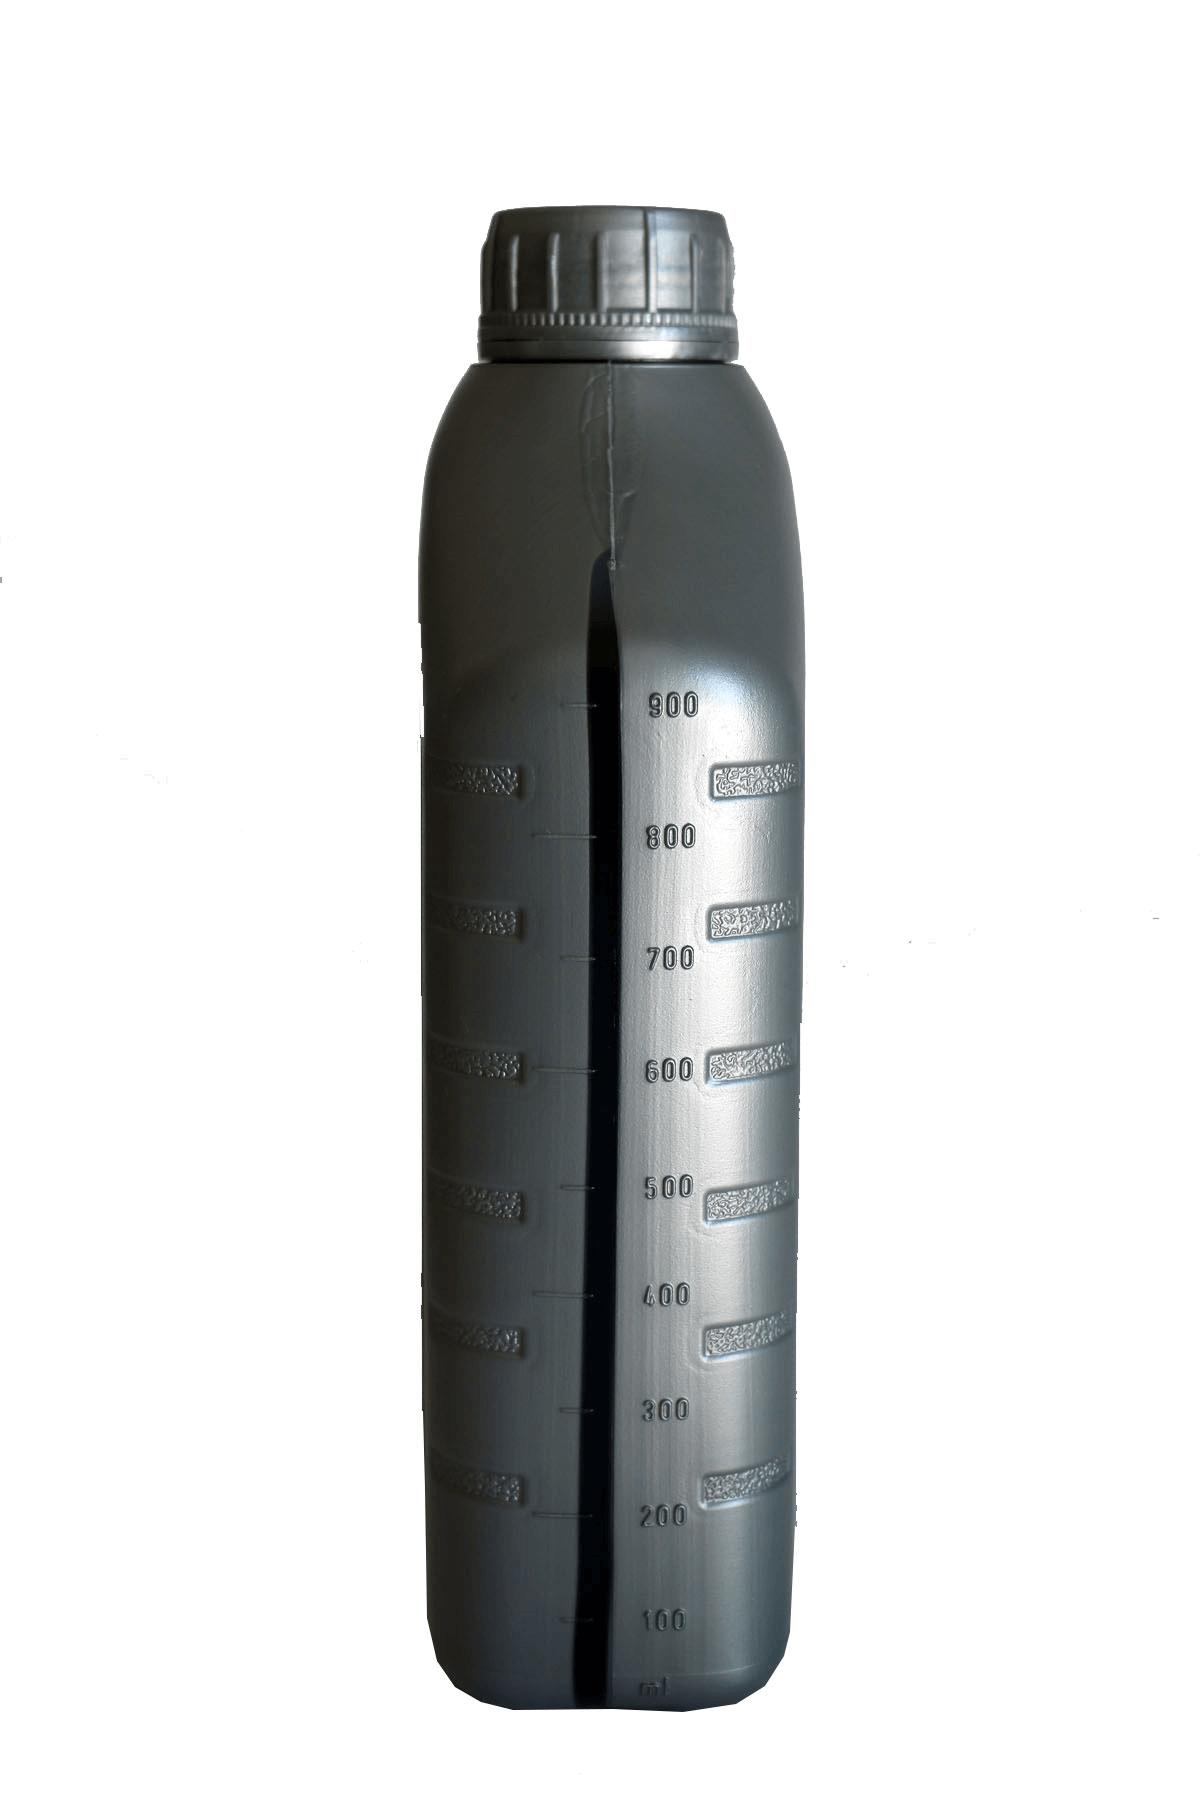 Mobil Super 3000 Formula V 5W-30 Motoröl, 1l